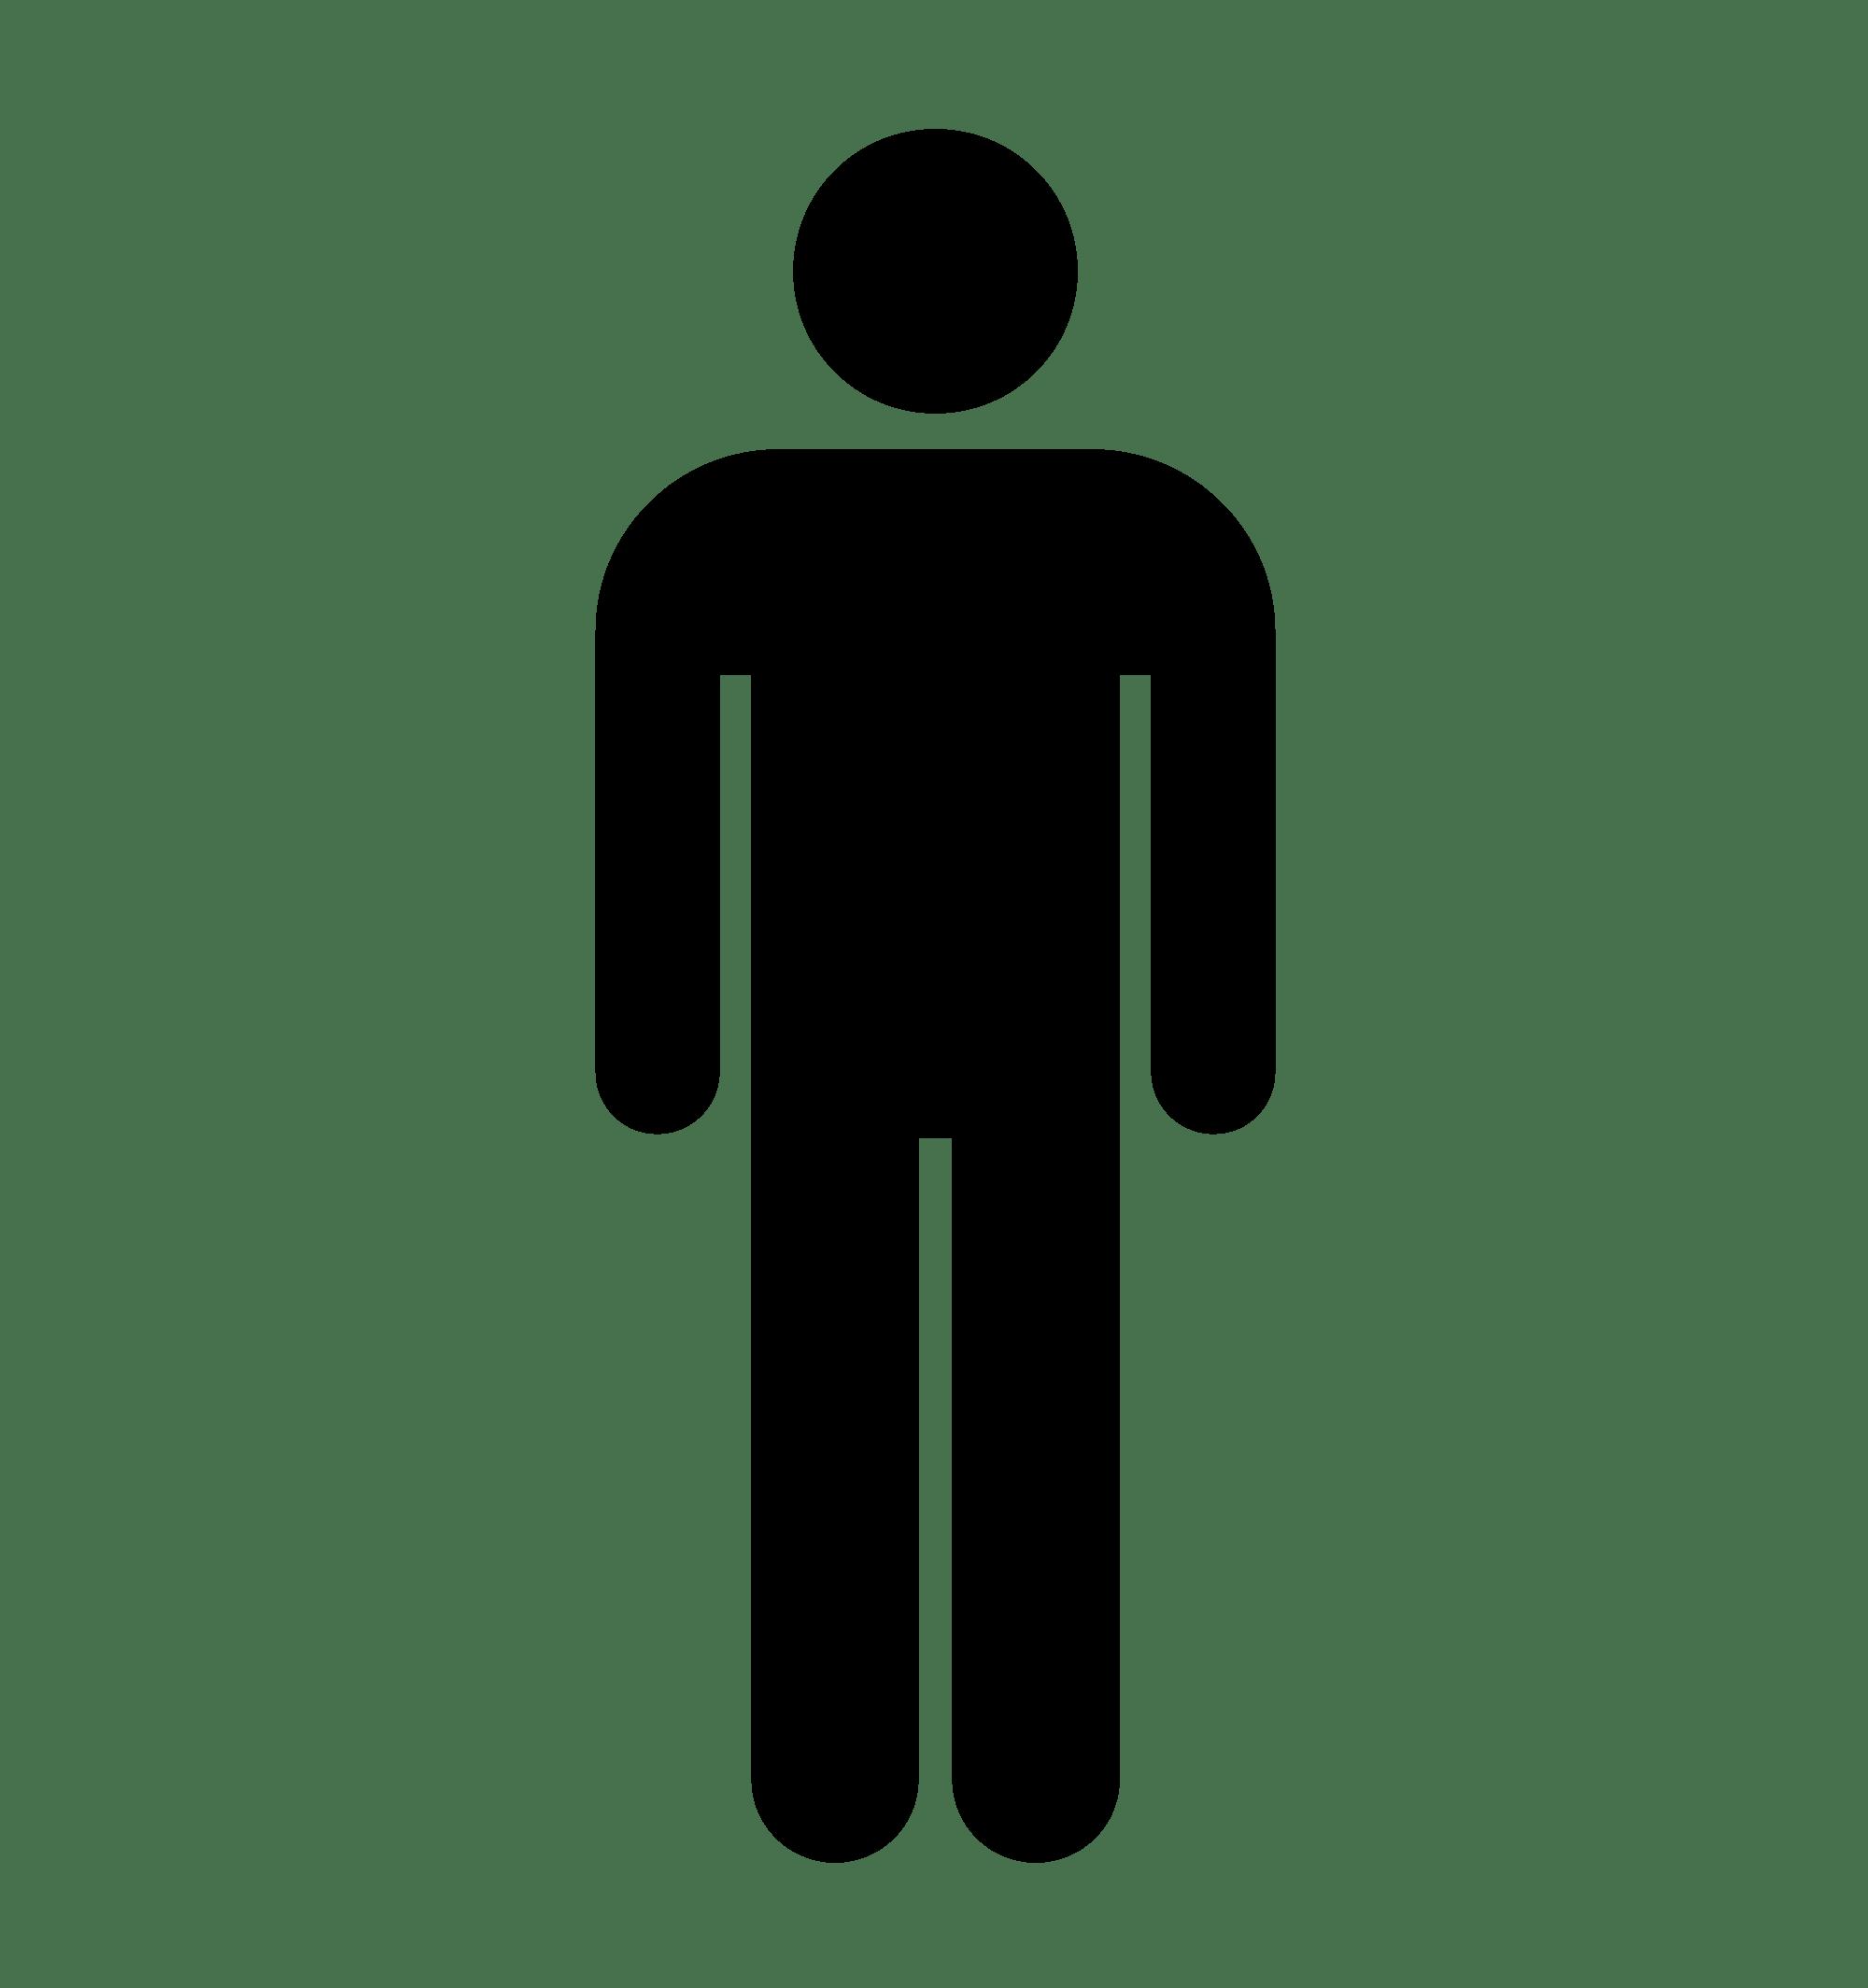 Person clipart icon clip art library download Person icon clipart 2 » Clipart Portal clip art library download